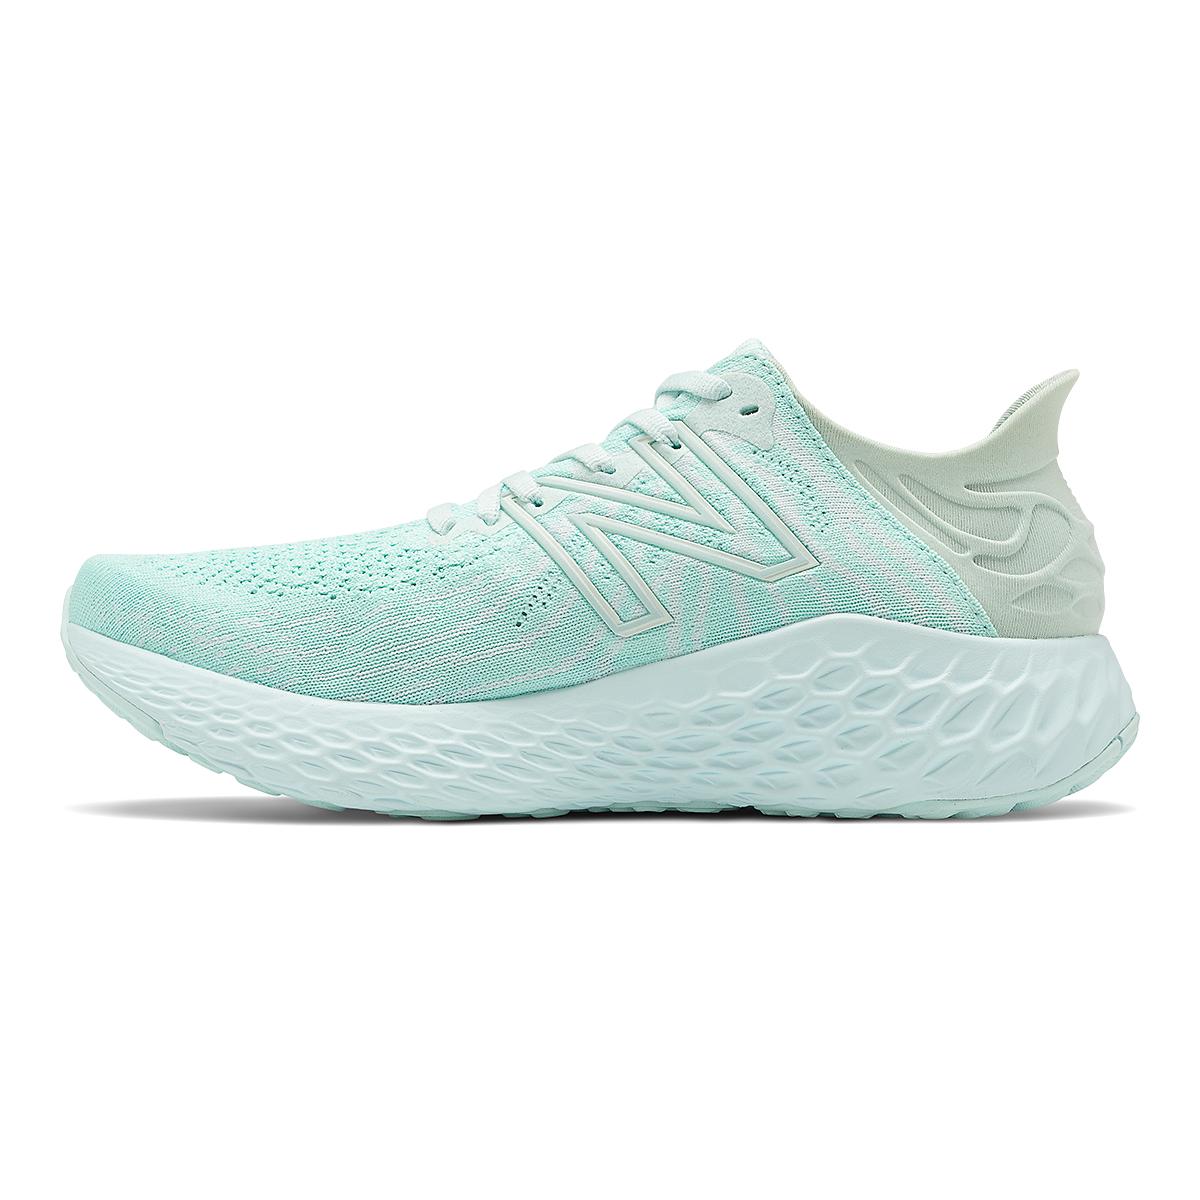 Women's New Balance Fresh Foam 1080V11 Running Shoe - Color: White Mint/White Jade - Size: 13 - Width: Regular, Mint Green, large, image 2